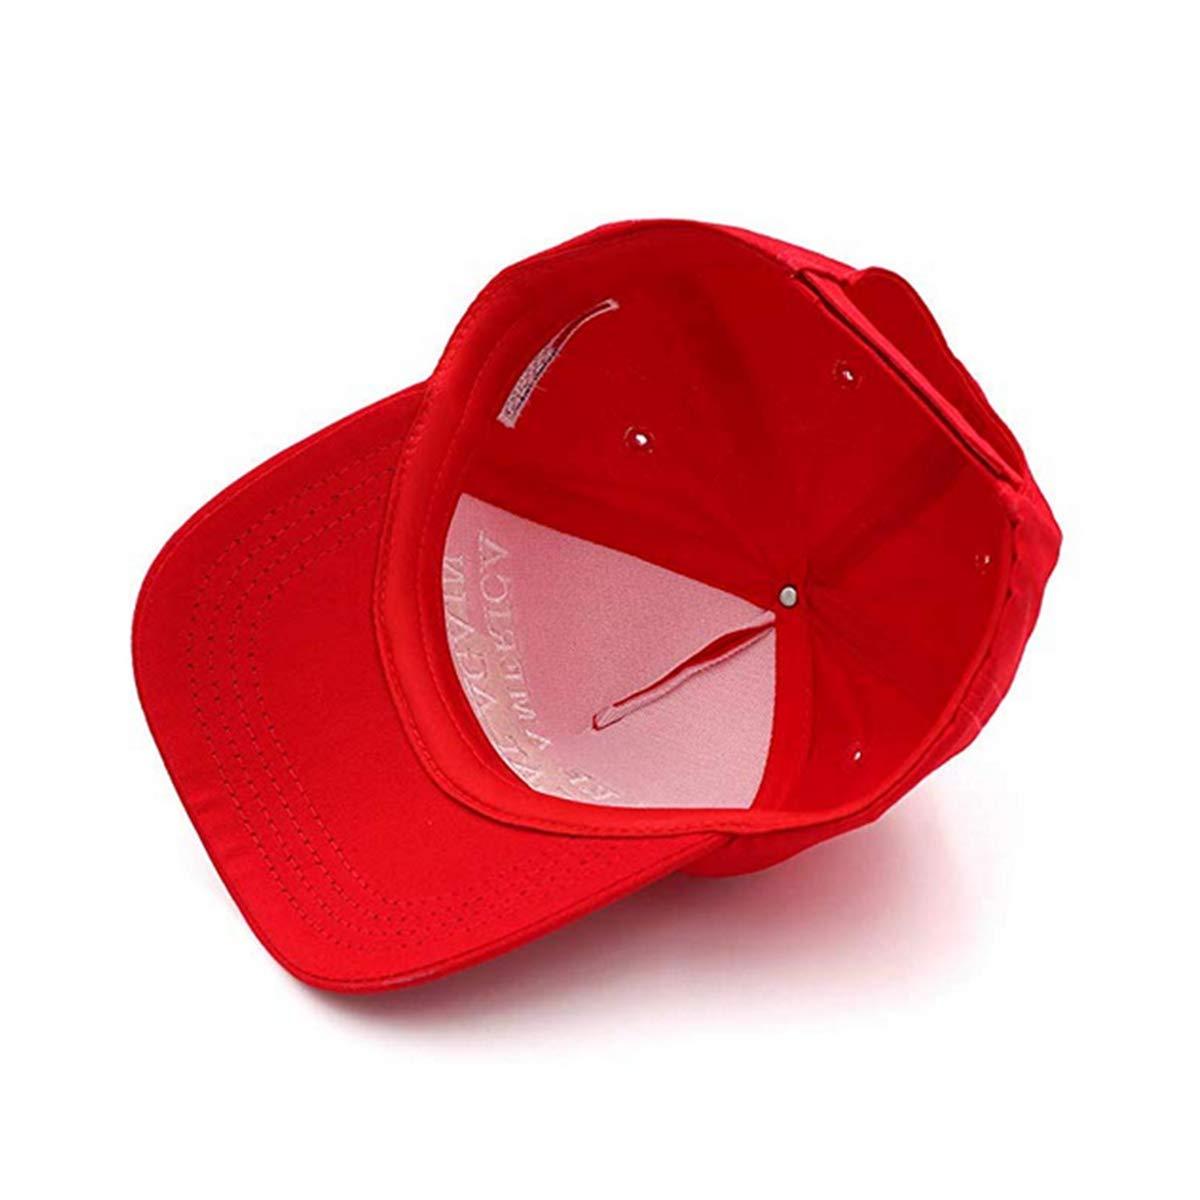 Donald Trump 2020 Keep America Great Camo Adjustable Cap Baseball Hat MAGA Hat with USA Flag